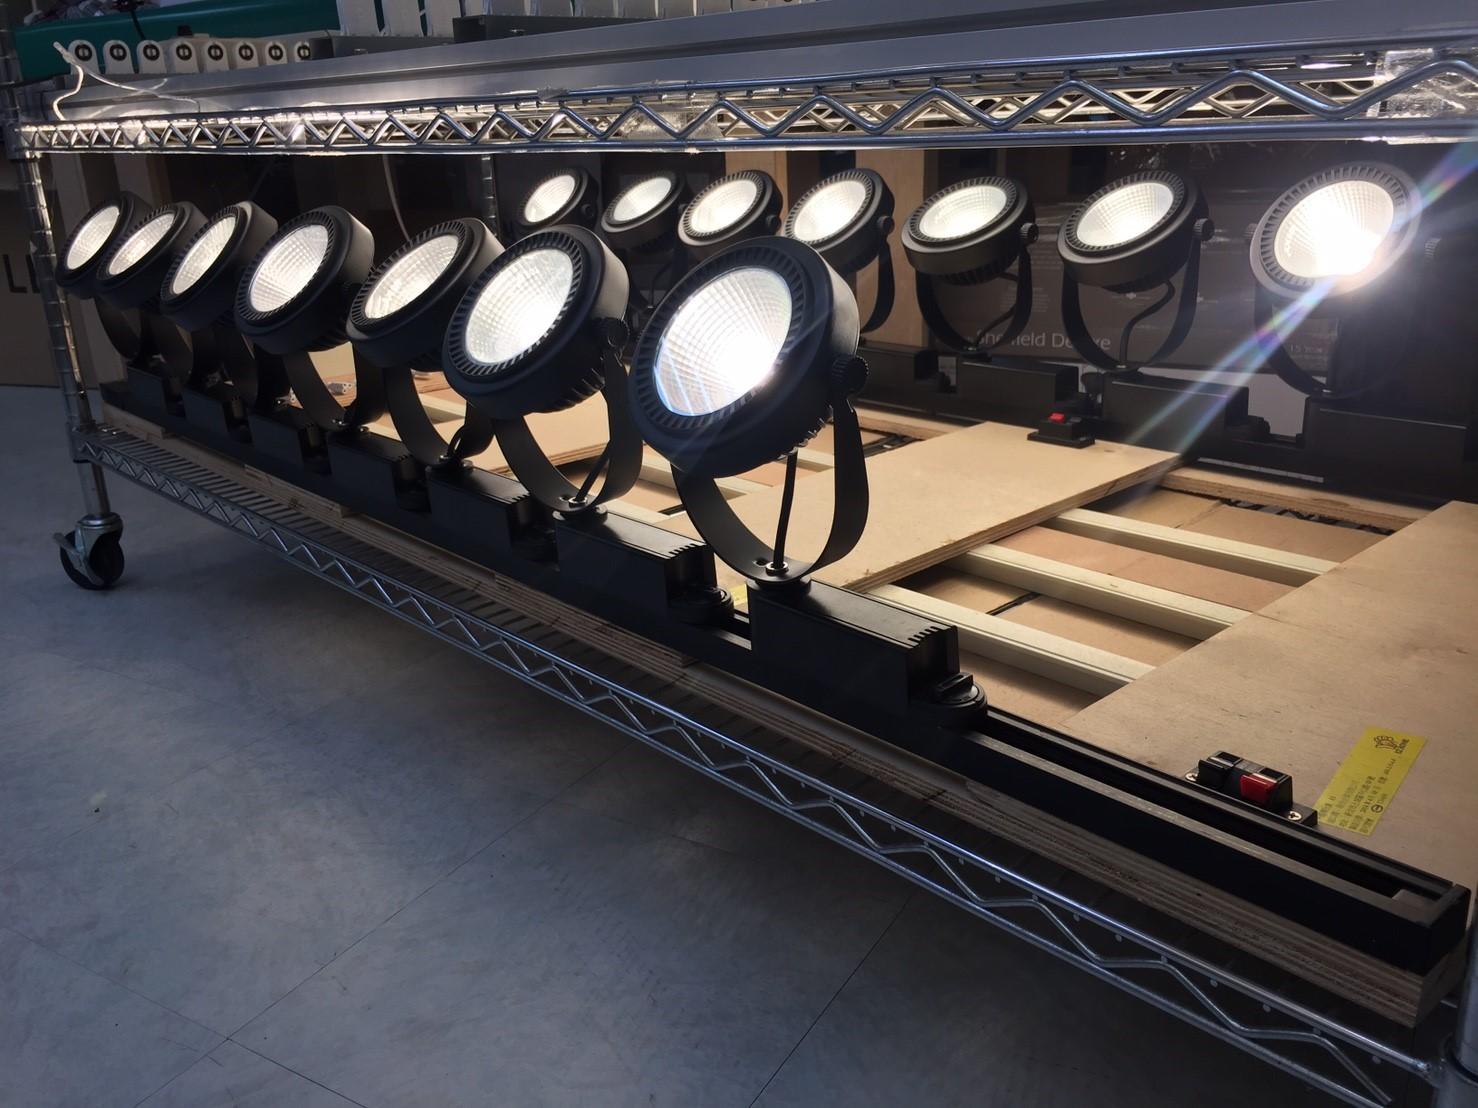 AR111壓鑄型外環式軌道燈161013_170209_0008